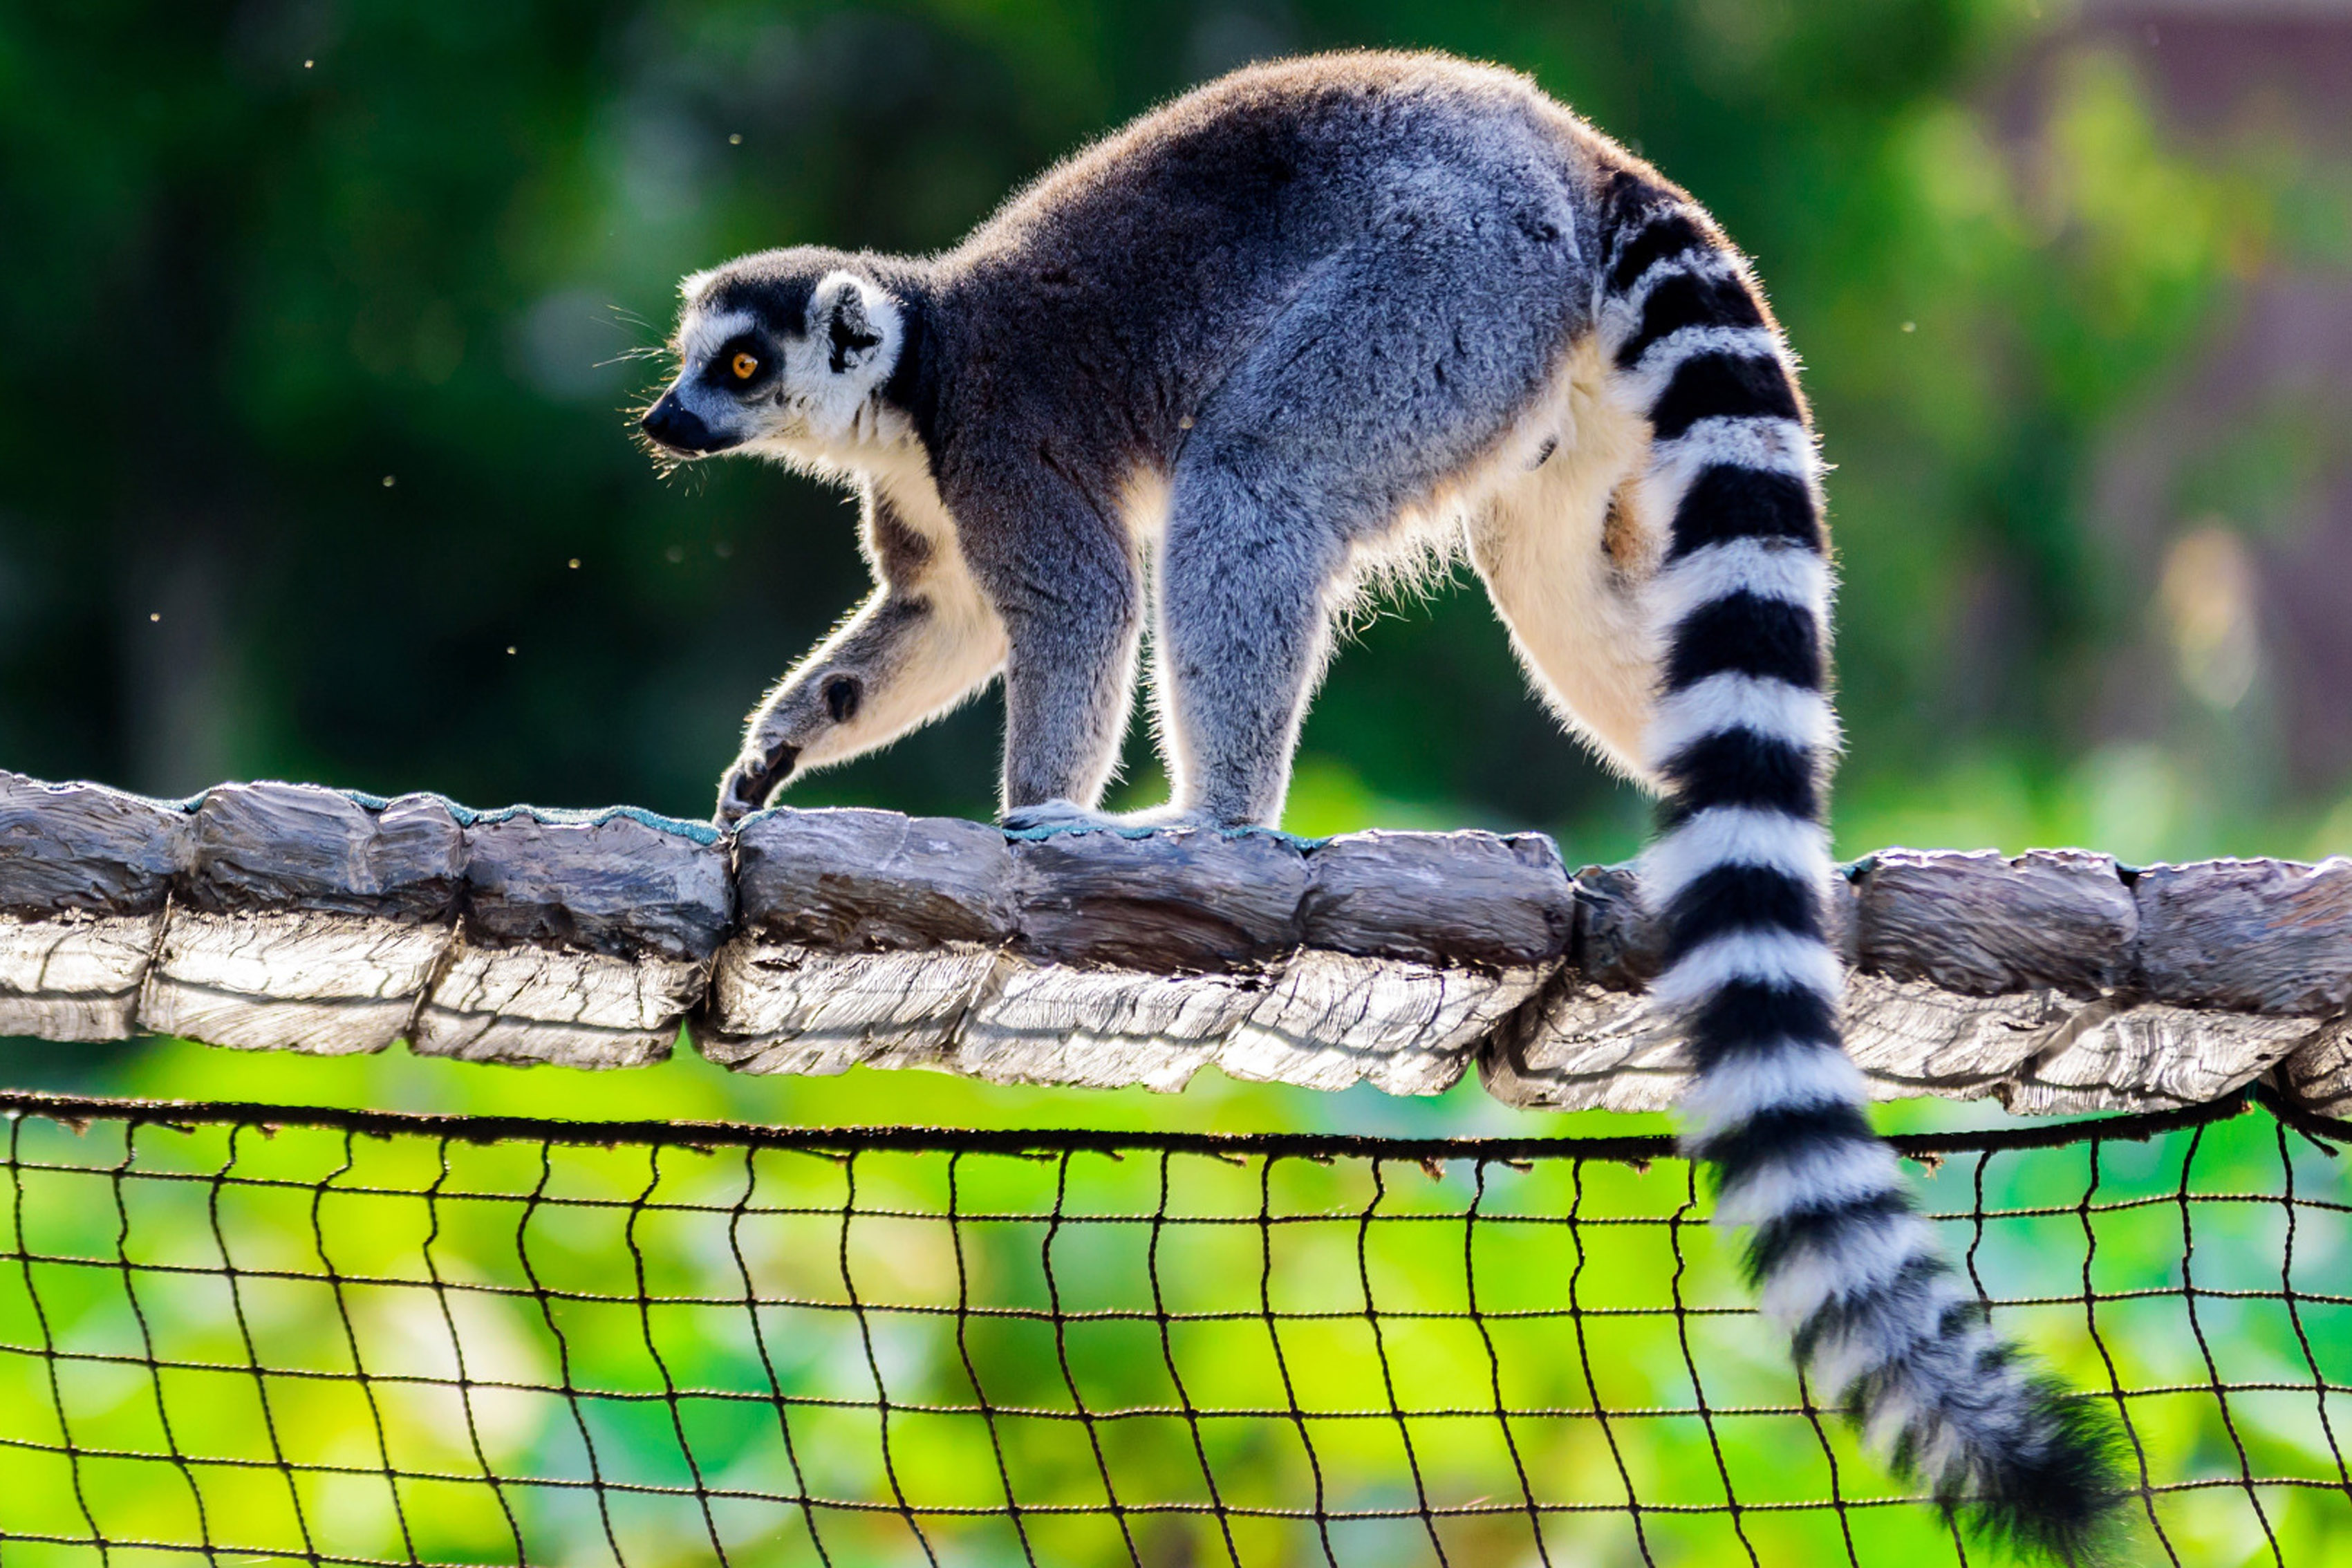 Decoración del hogar lemur setka poza svet fon zoopark tela de seda póster impreso DW190411